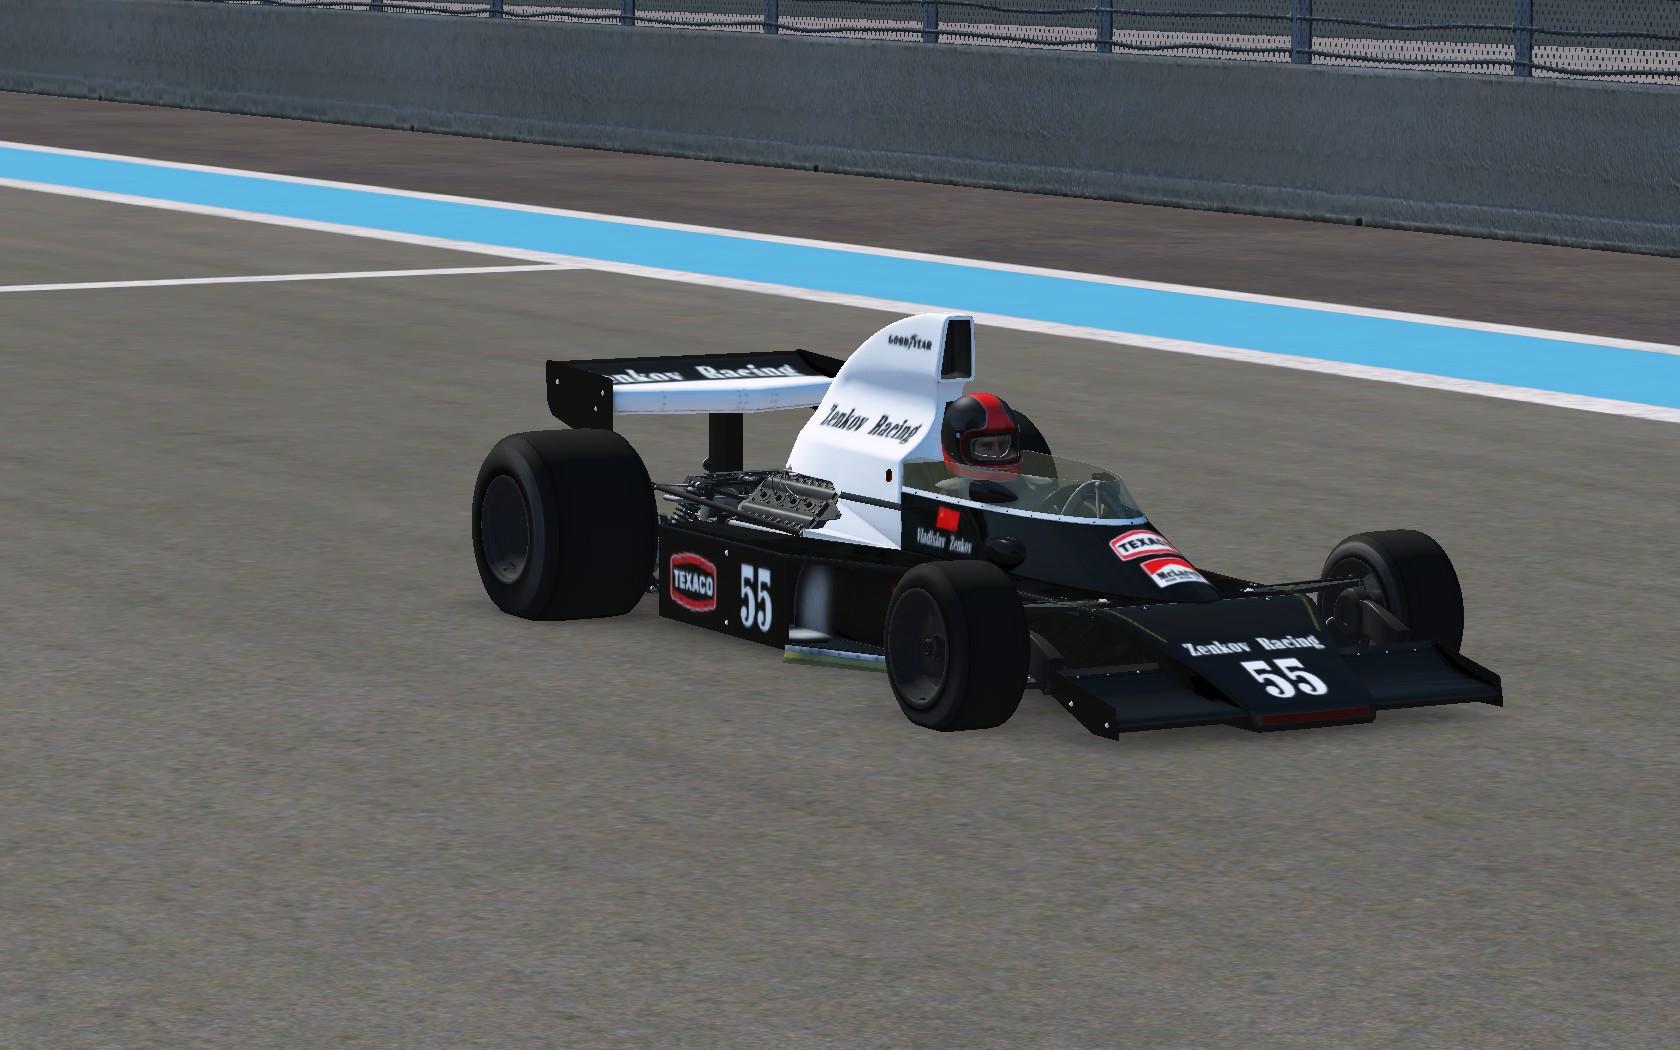 GP247 Speedweeks II - Grand Prix (March 21-April 4) UaDfv0JOY_s